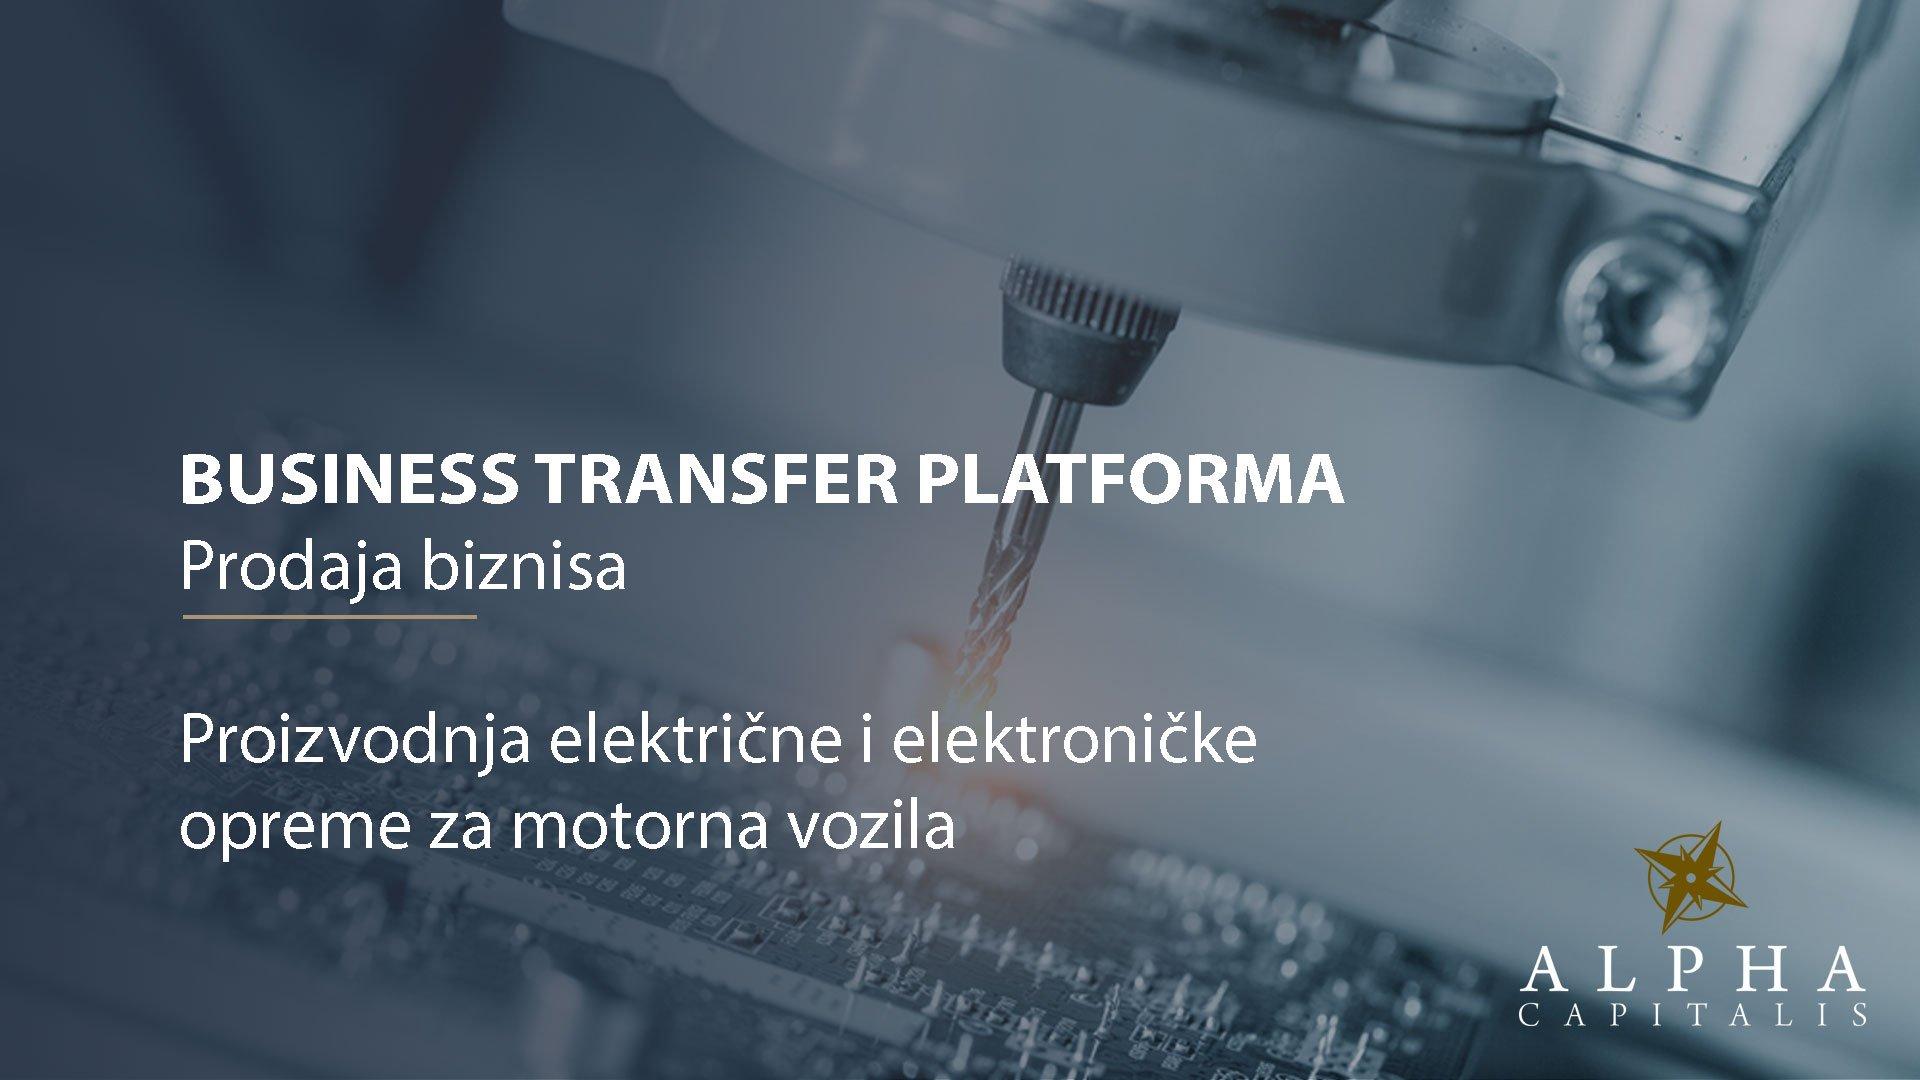 Business-transfer-platforma-proizvodnja-električne-elektroničke-opreme-za-motorna-vozila